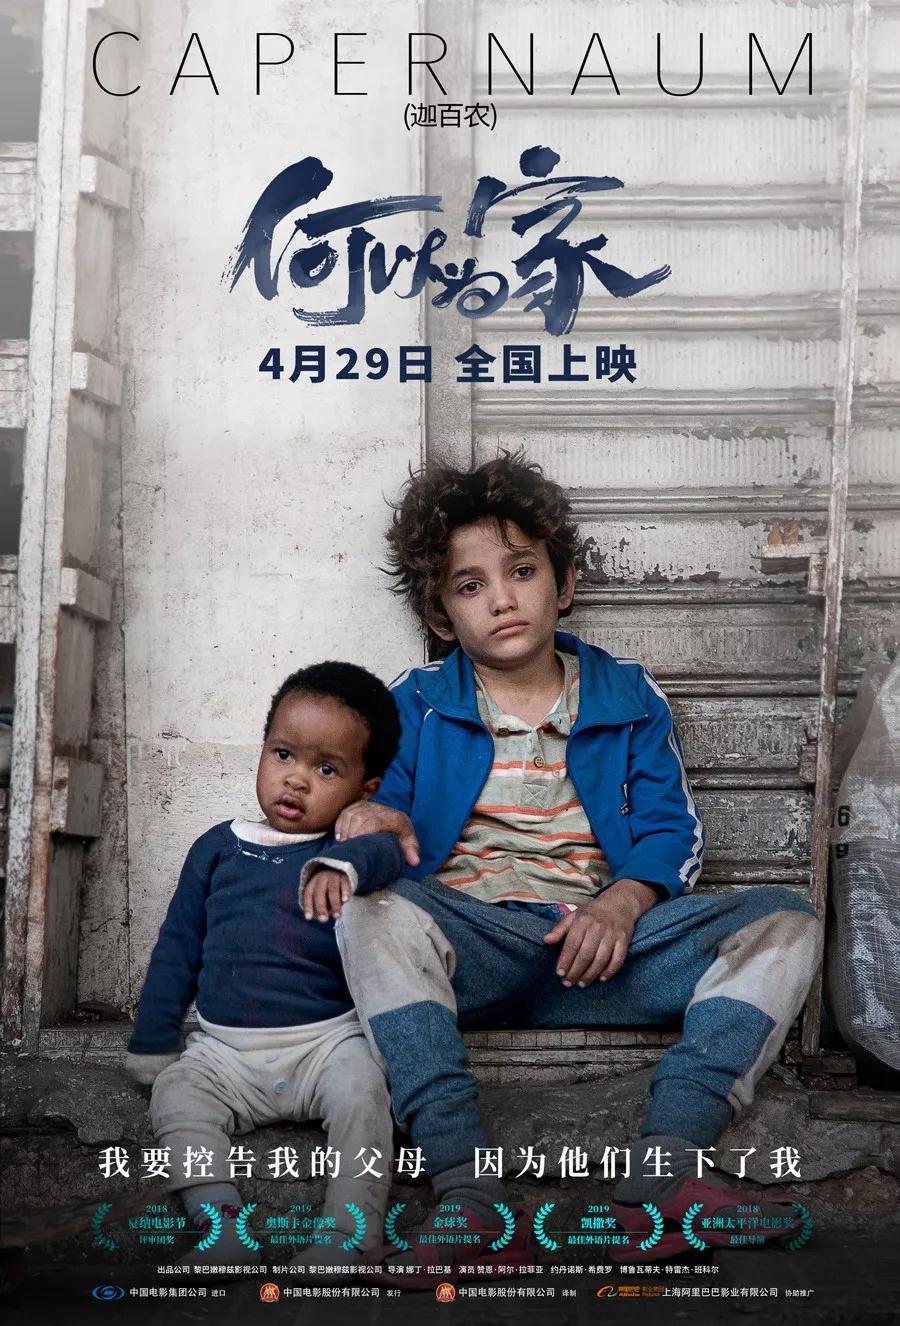 <b>2019年十佳电影,它已预订一席</b>